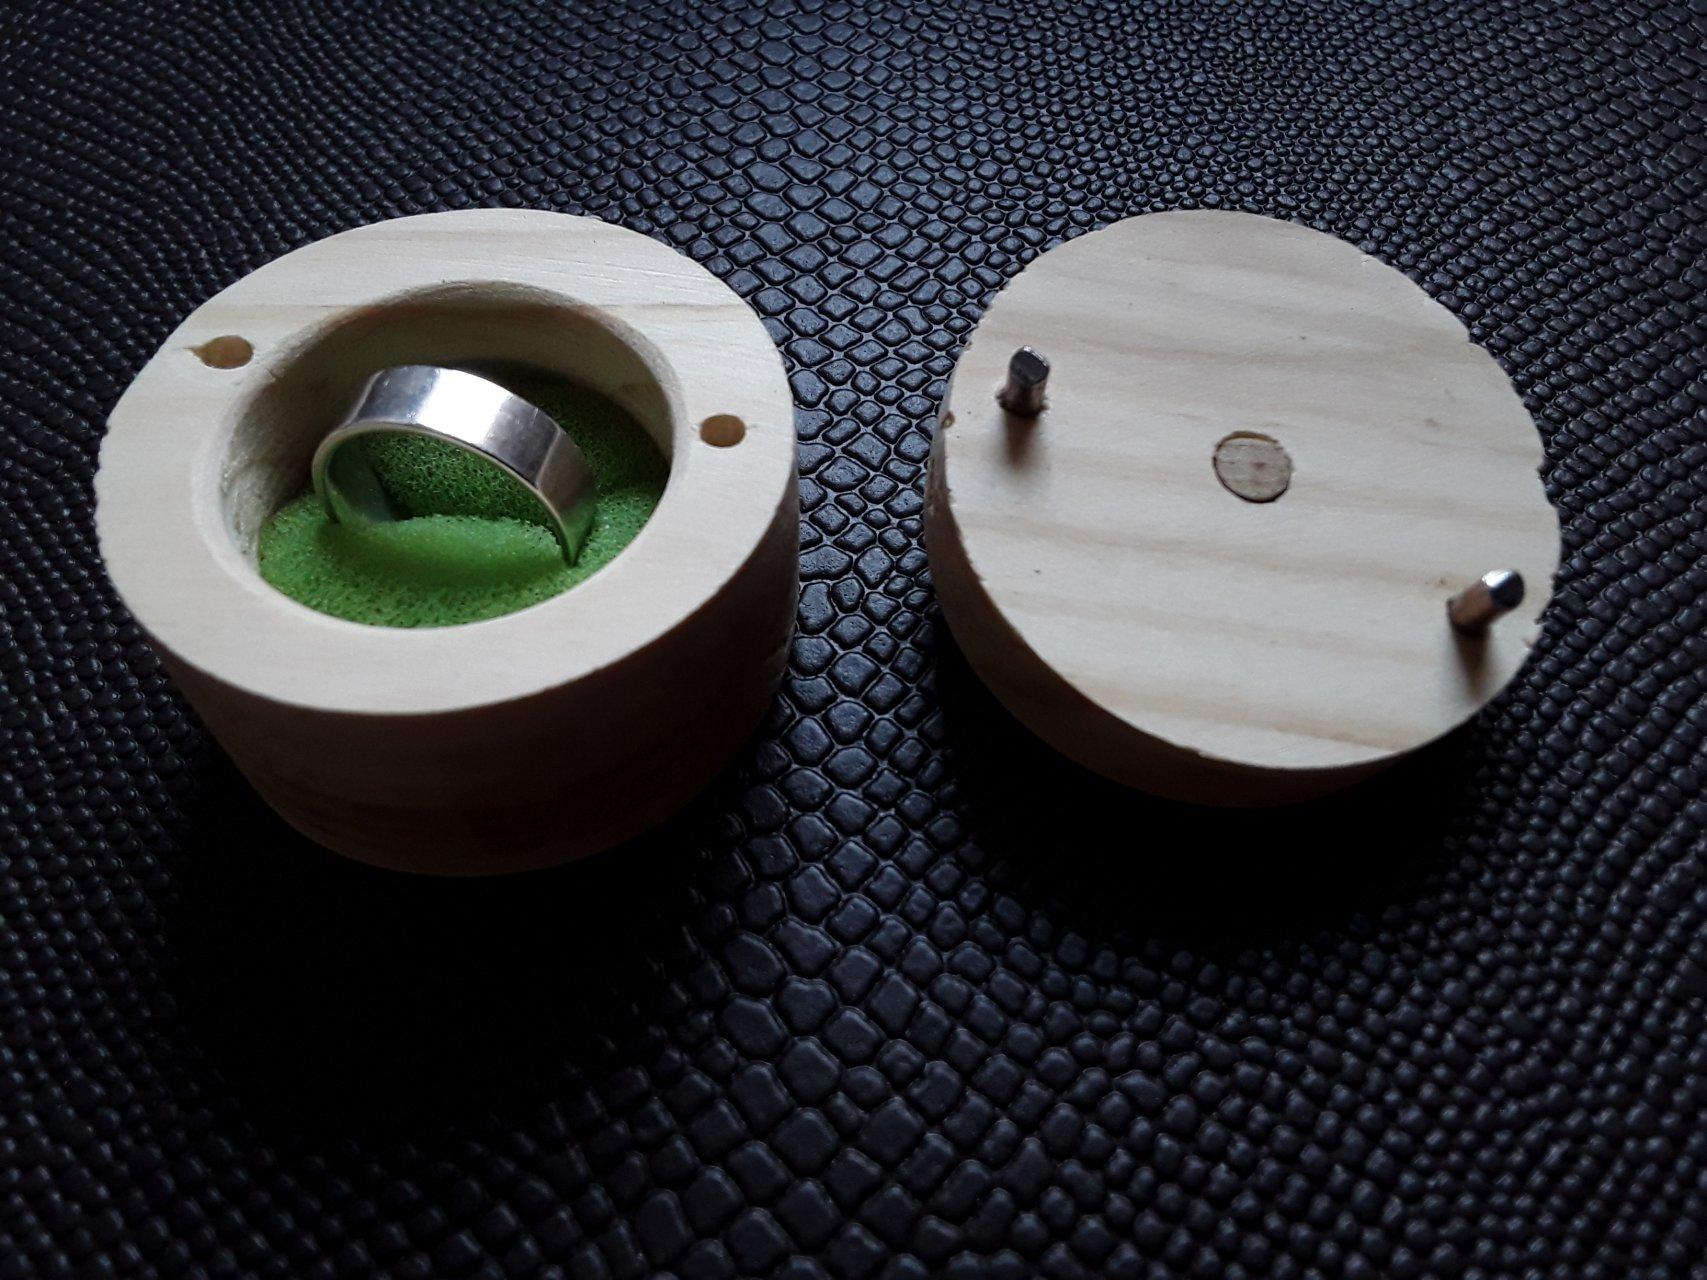 جا انگشتری چوبی